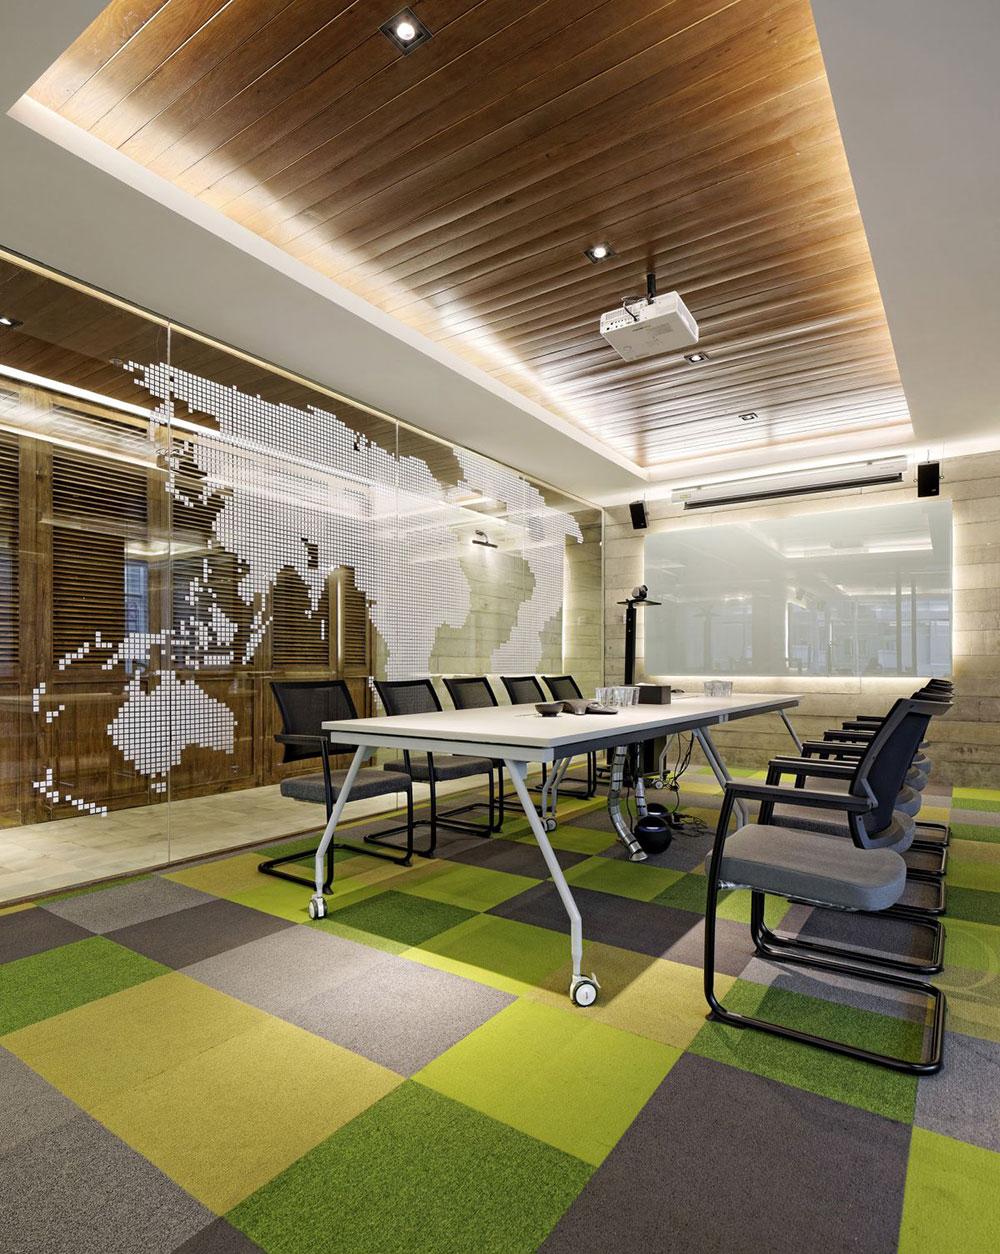 Meet 6 Easy Ways To Improve Office Productivity